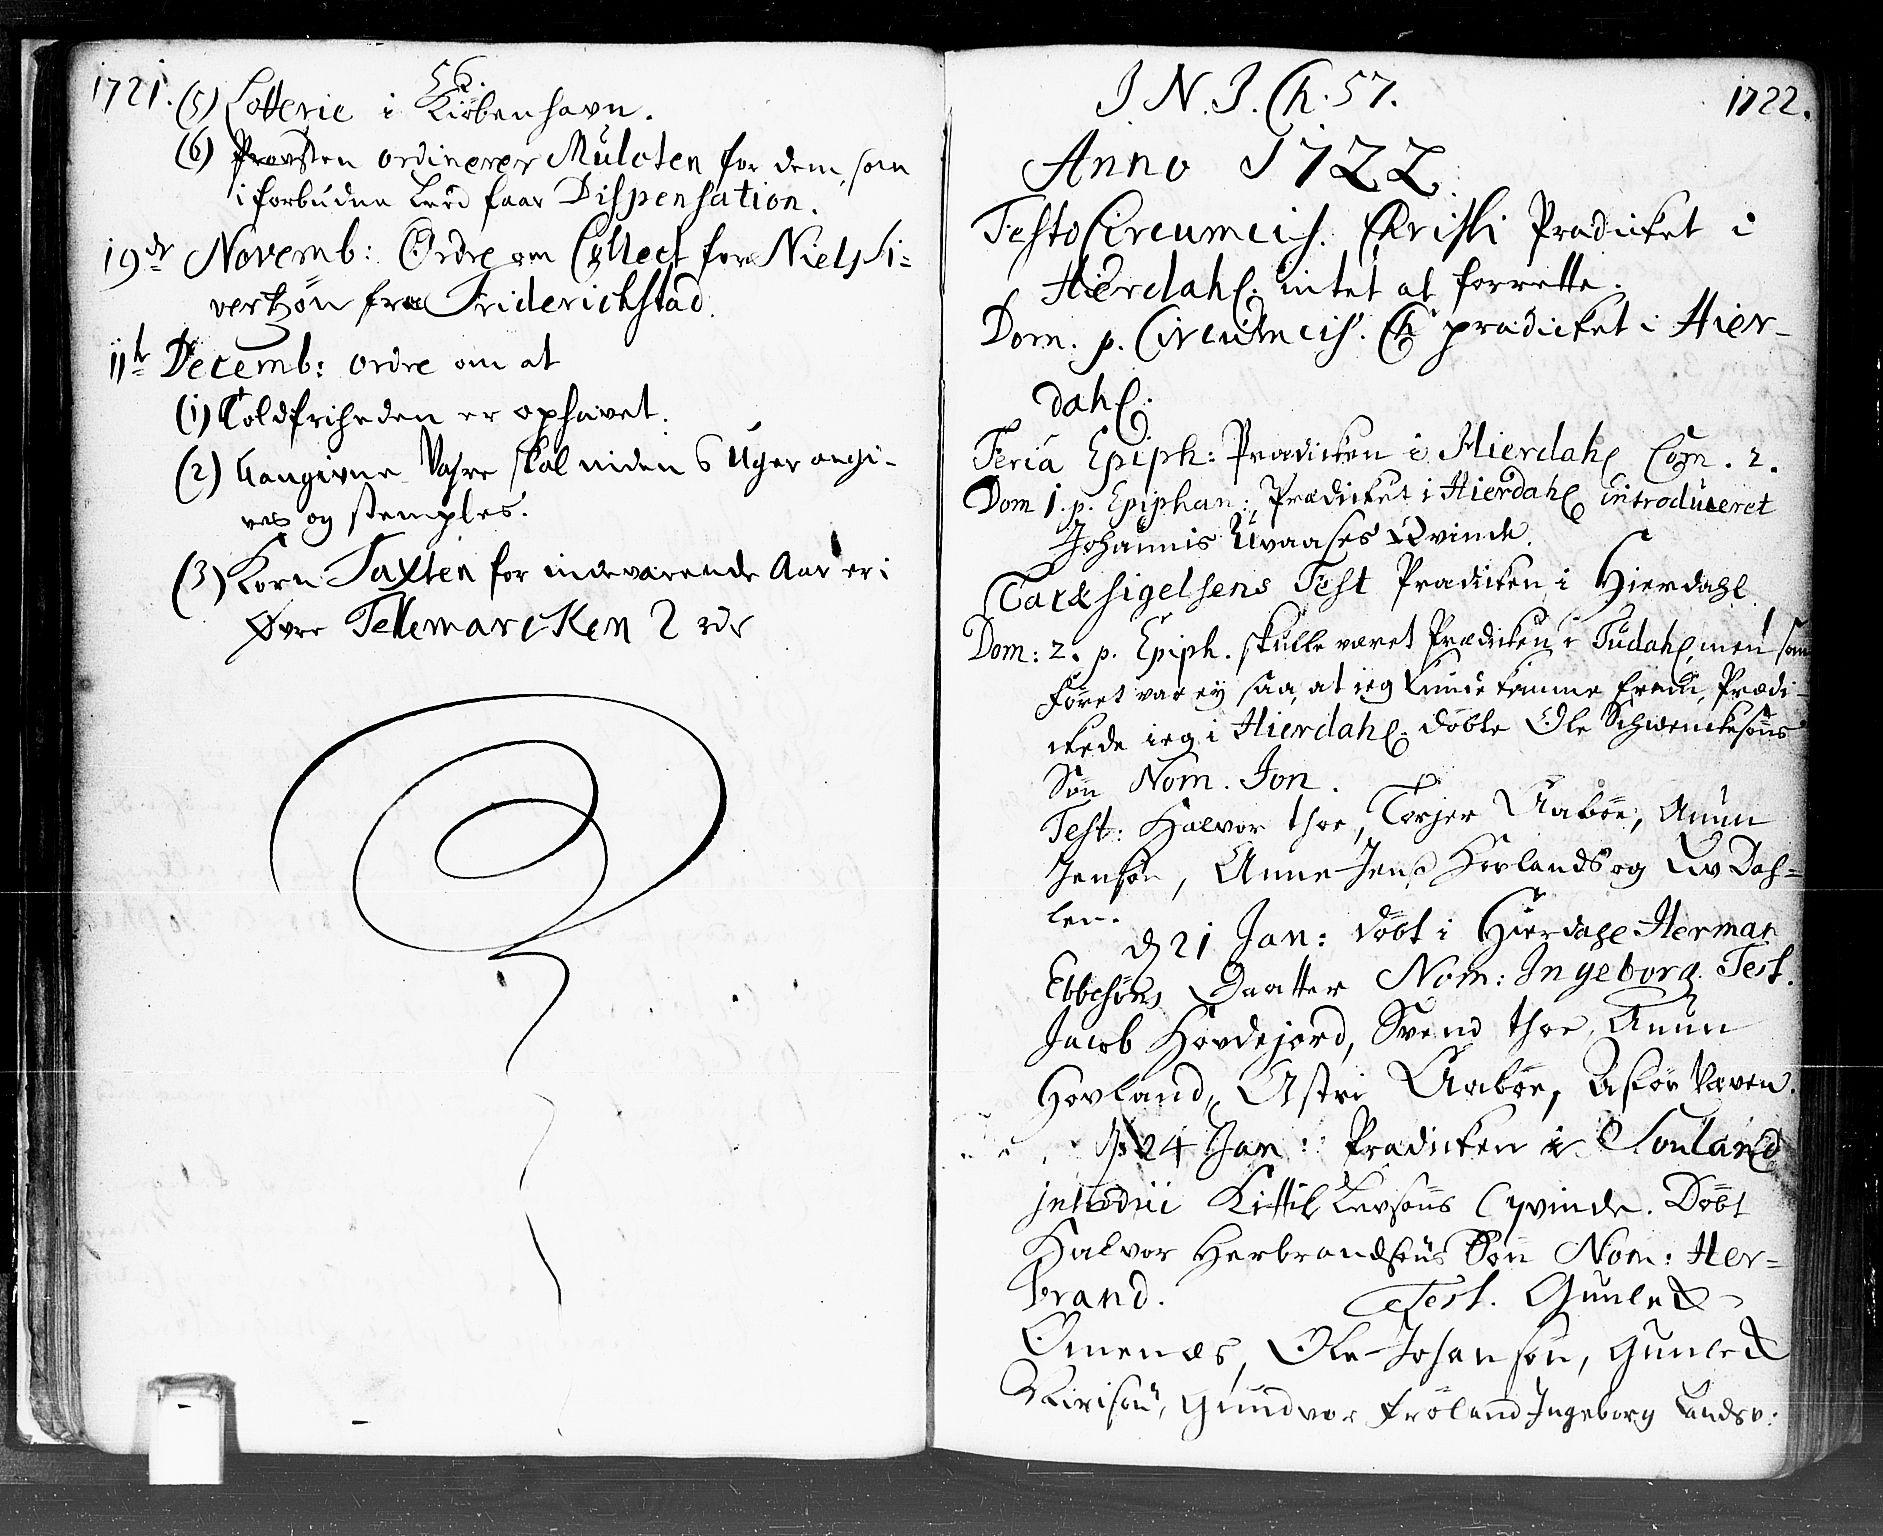 SAKO, Hjartdal kirkebøker, F/Fa/L0002: Ministerialbok nr. I 2, 1716-1754, s. 56-57